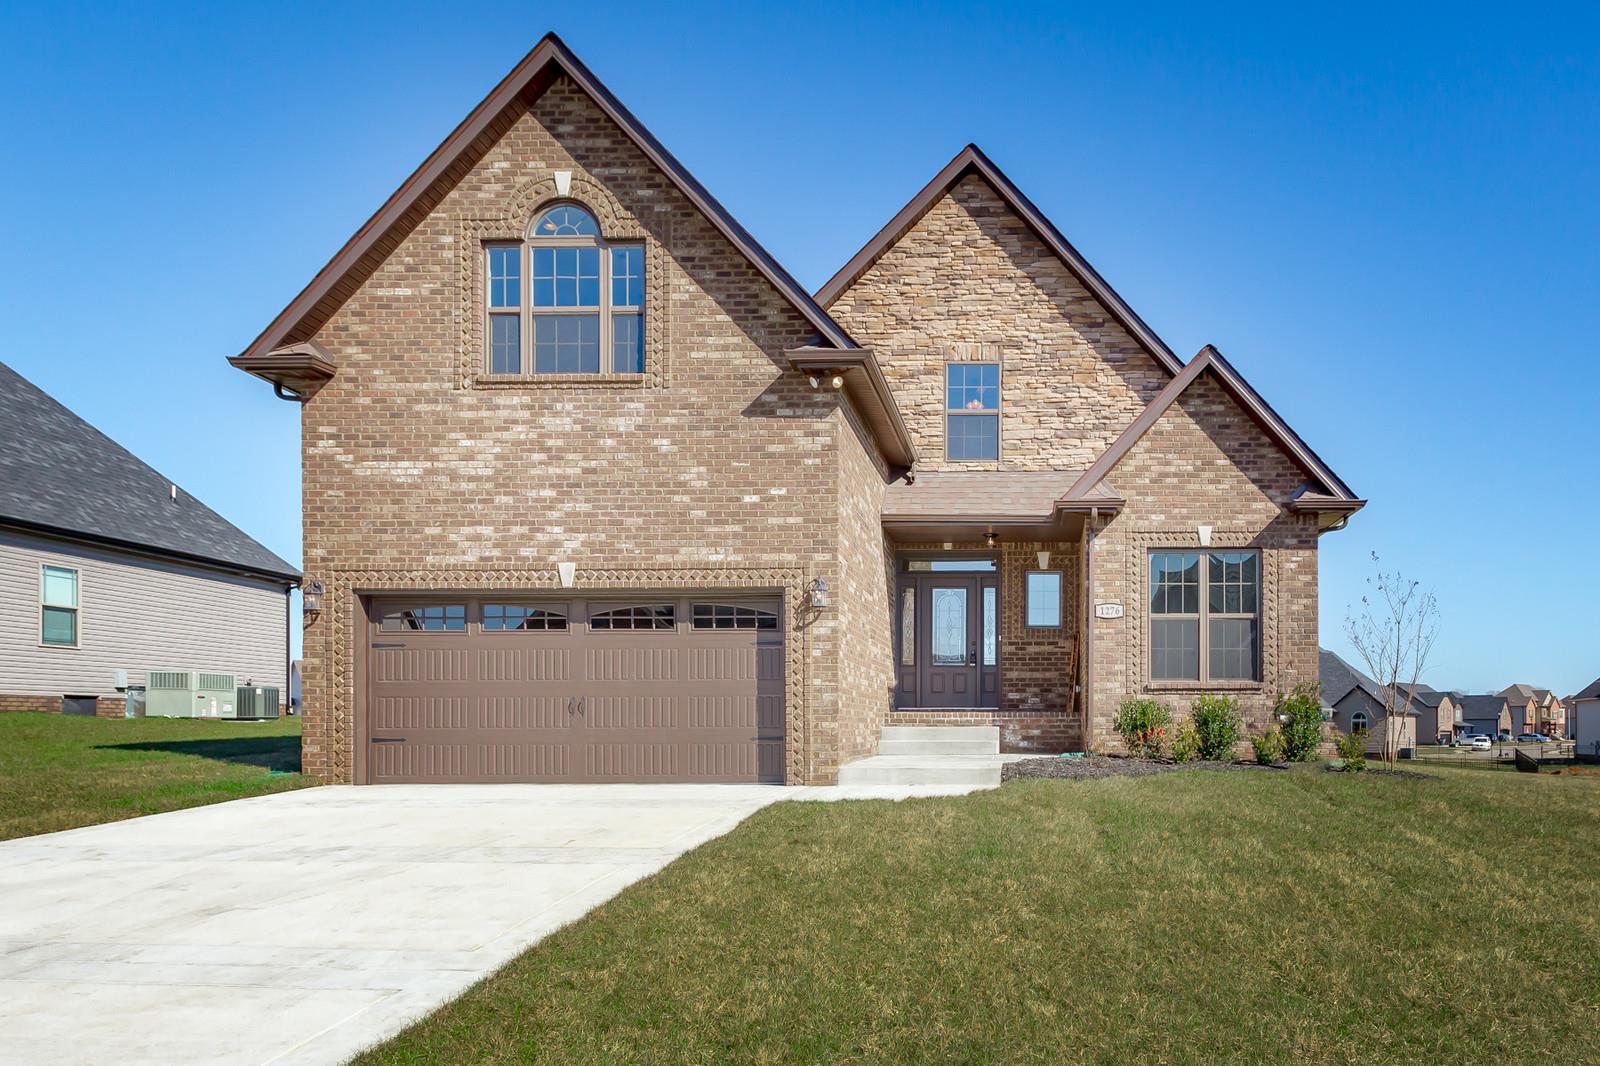 1276 Upland Terrace, Clarksville, TN 37043 - Clarksville, TN real estate listing